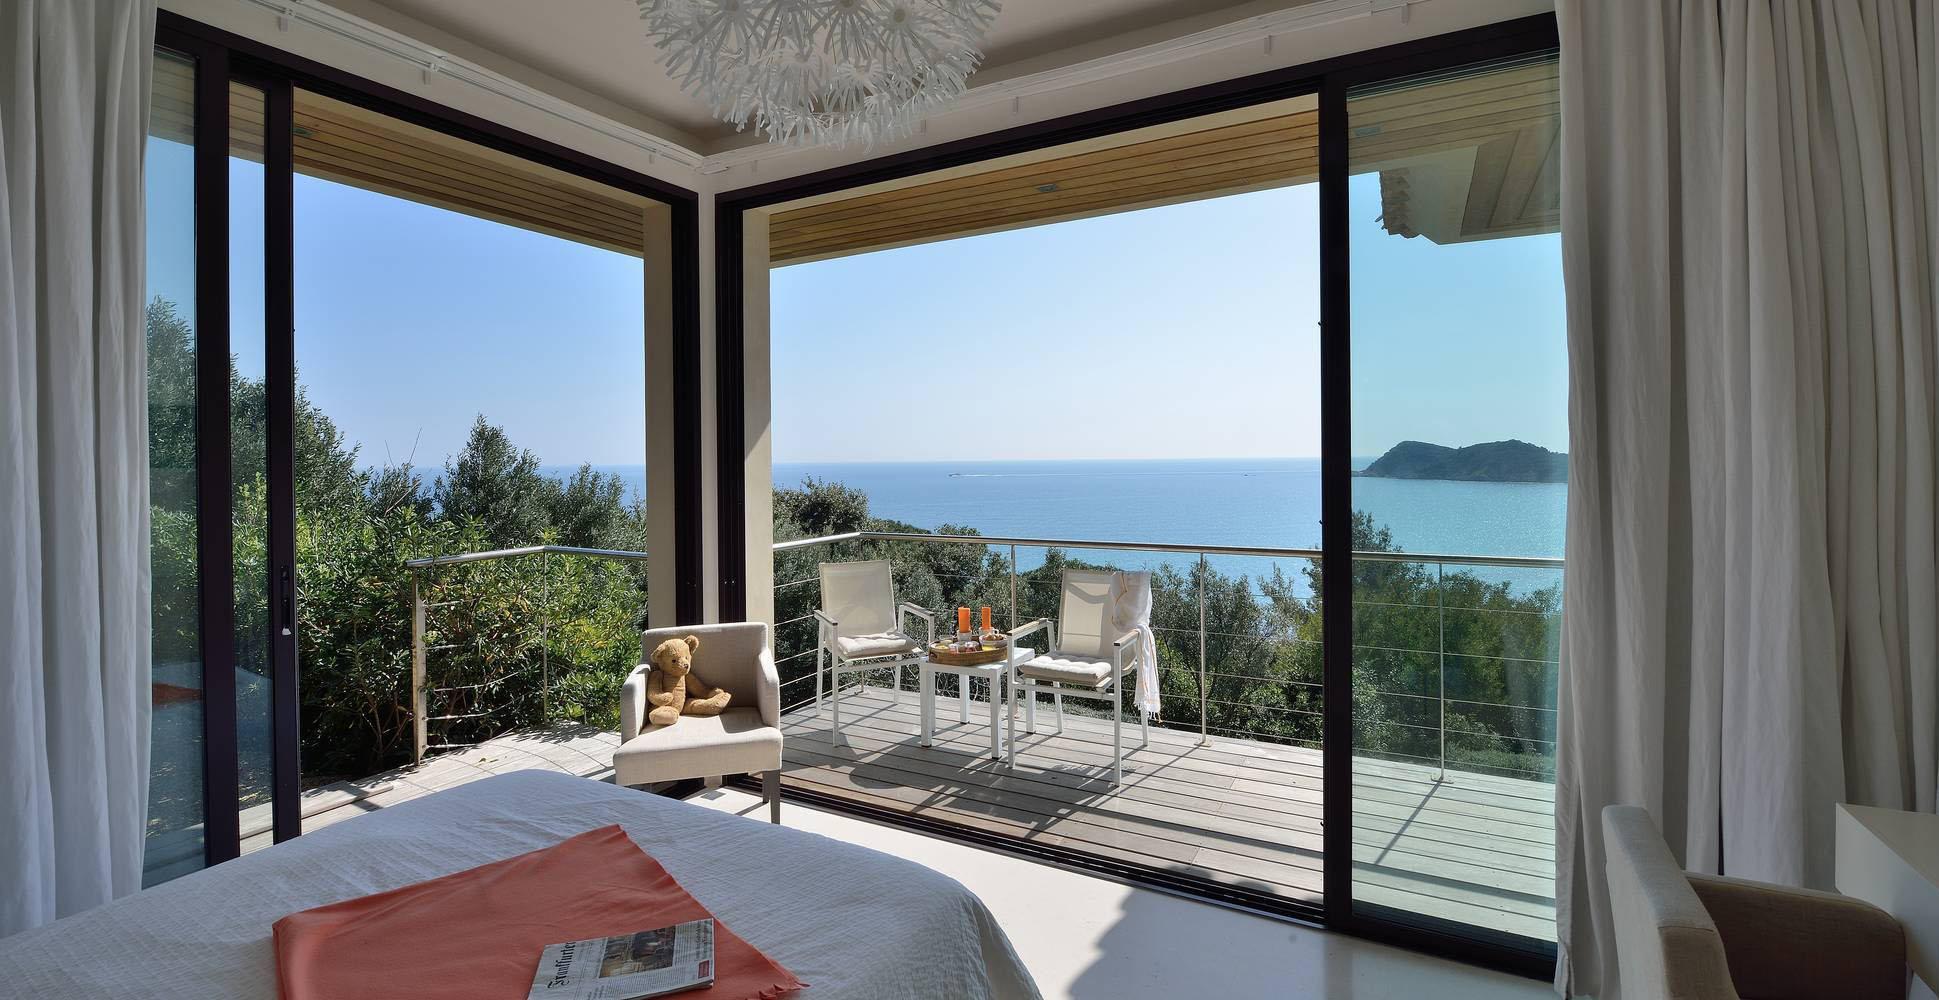 Provenal Style Villa In Saint Tropez With Stunning Ocean View IDesignArch Interior Design